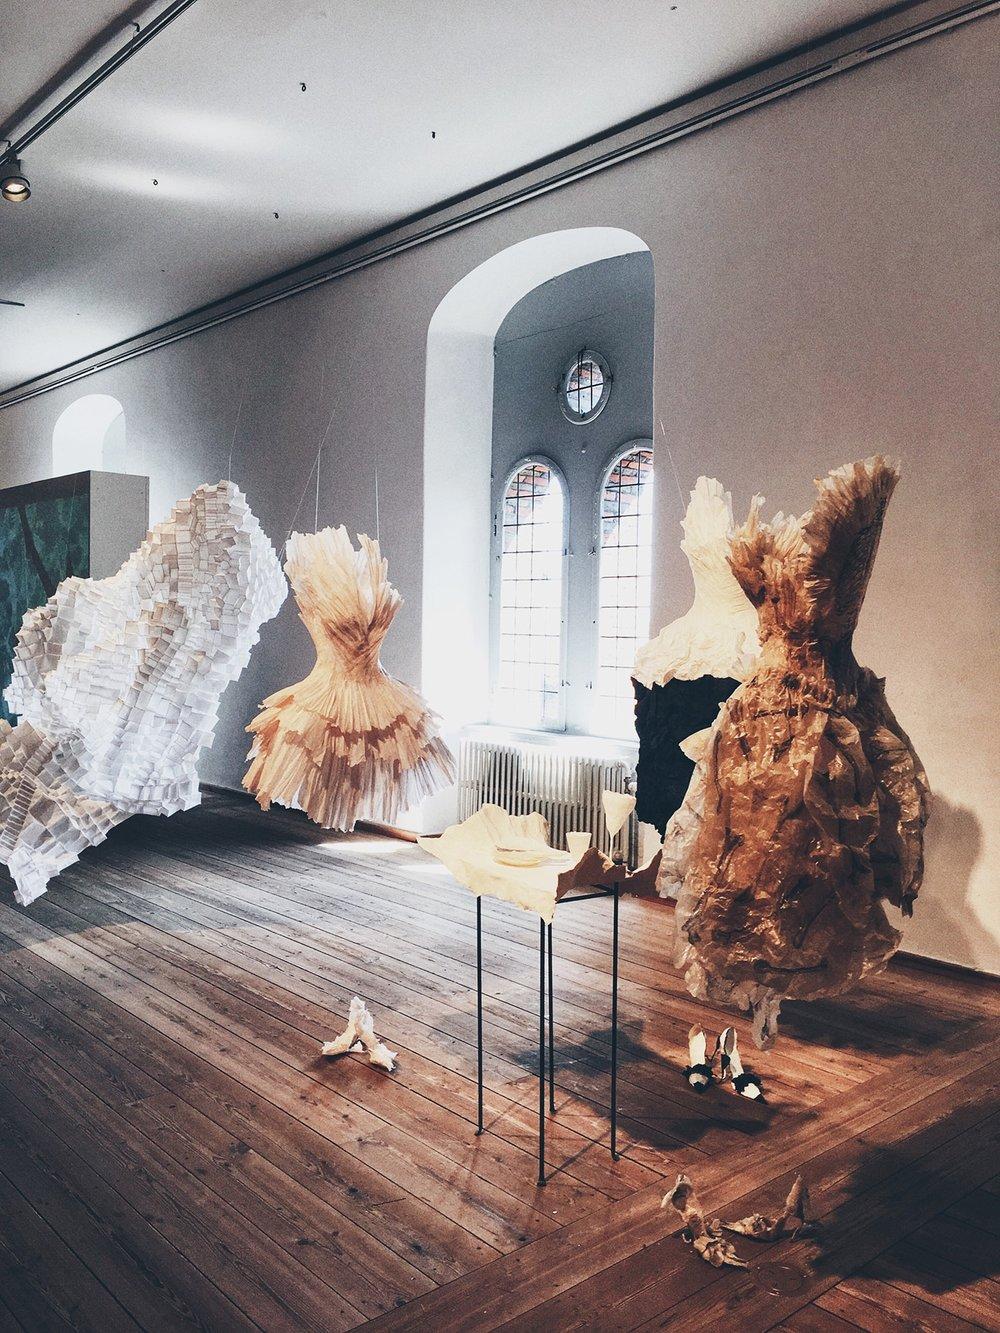 Art exhibition inside the Library Hall of the Round Tower (Copenhagen, Denmark)